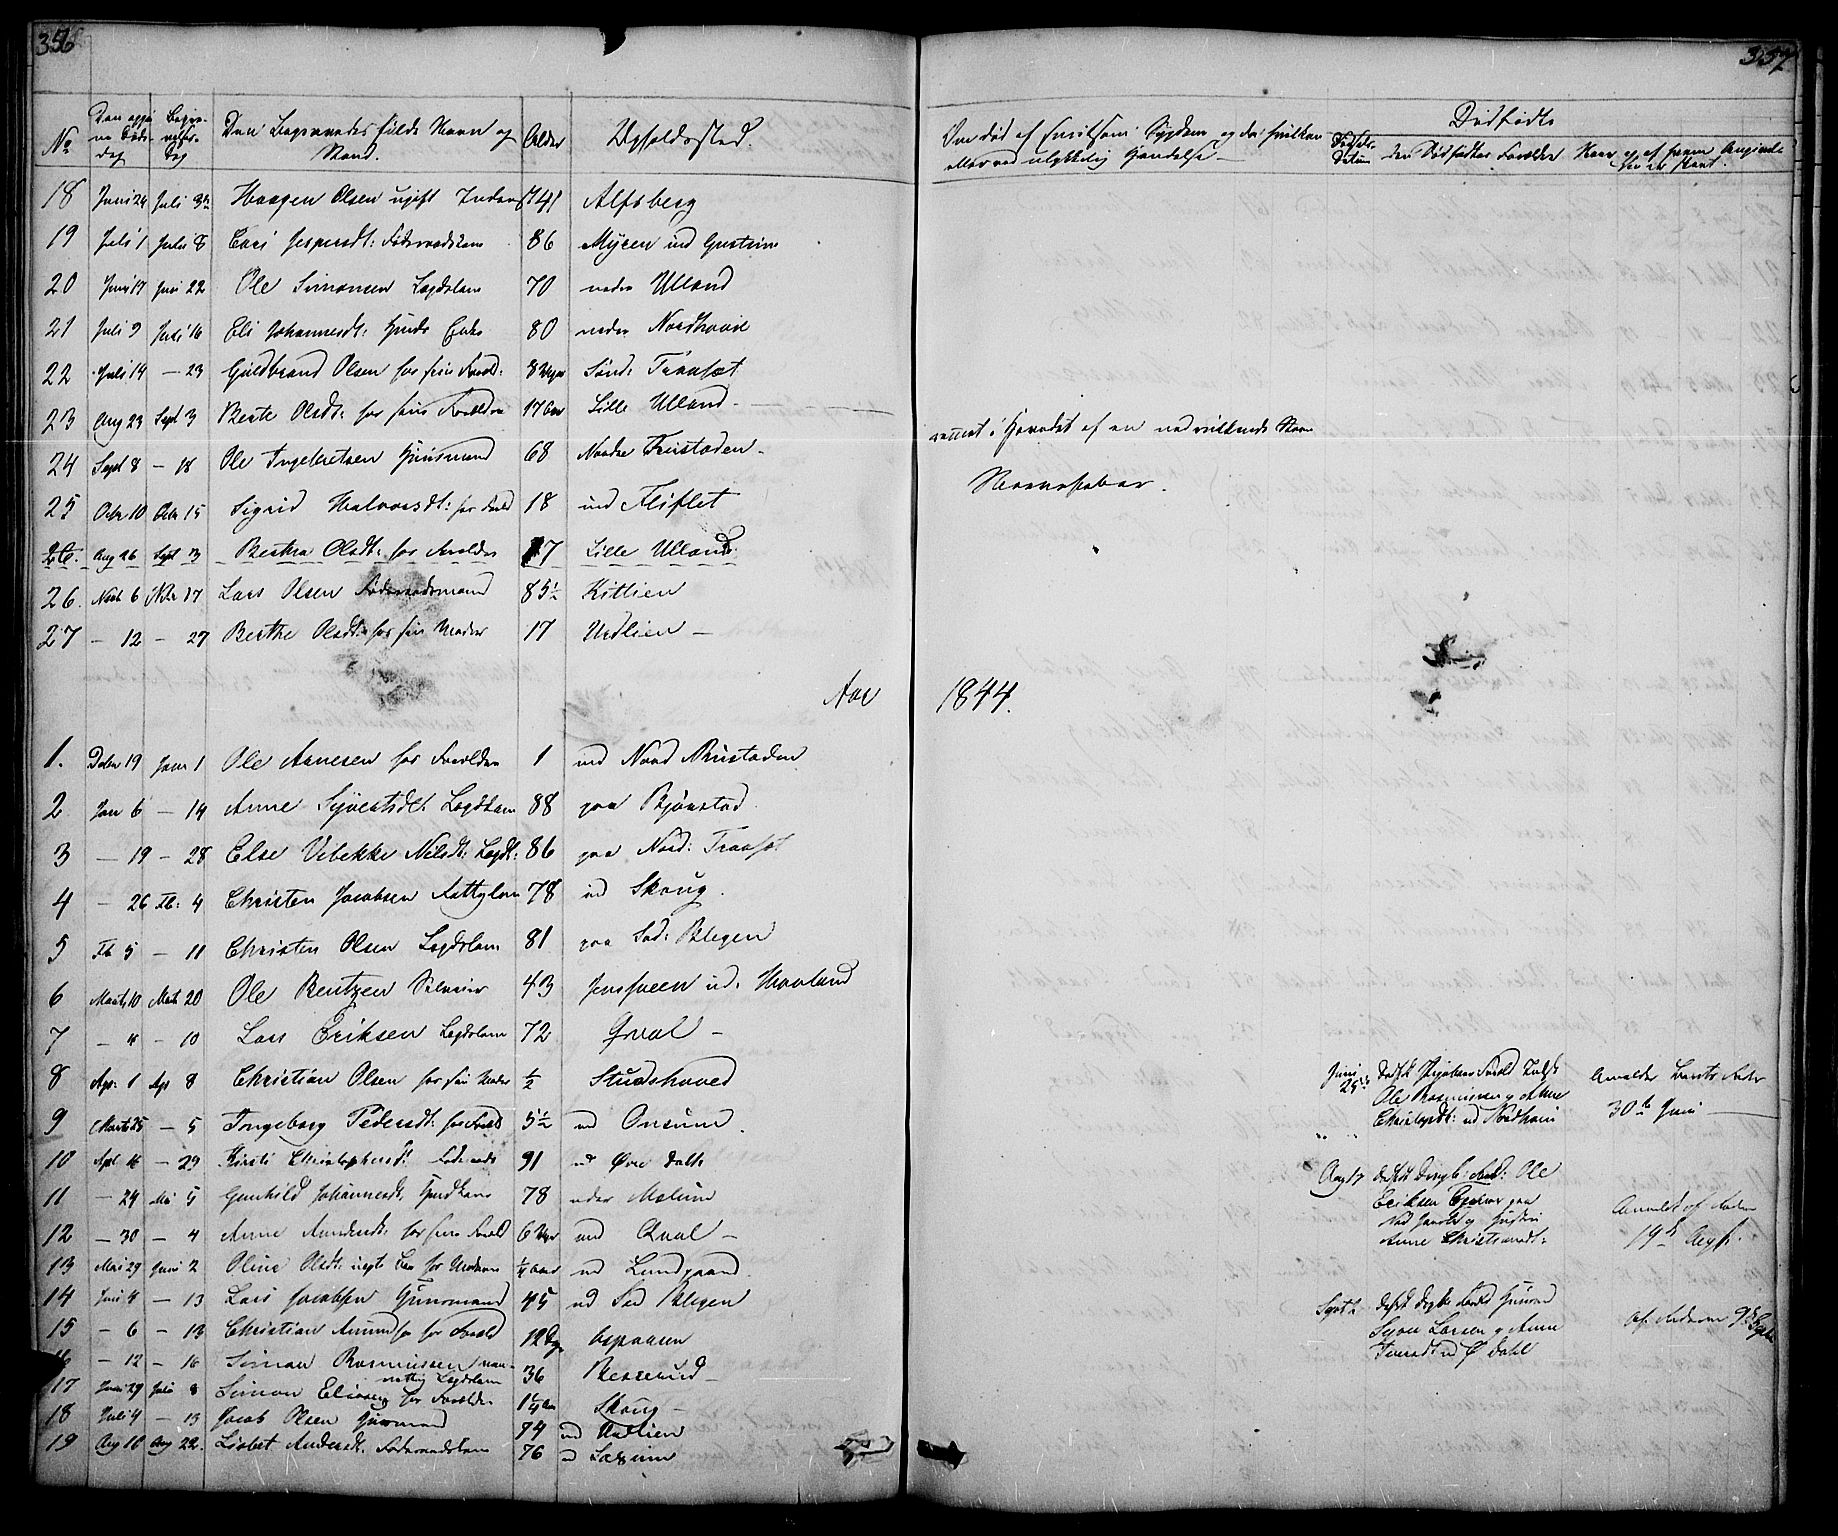 SAH, Fåberg prestekontor, Klokkerbok nr. 5, 1837-1864, s. 356-357